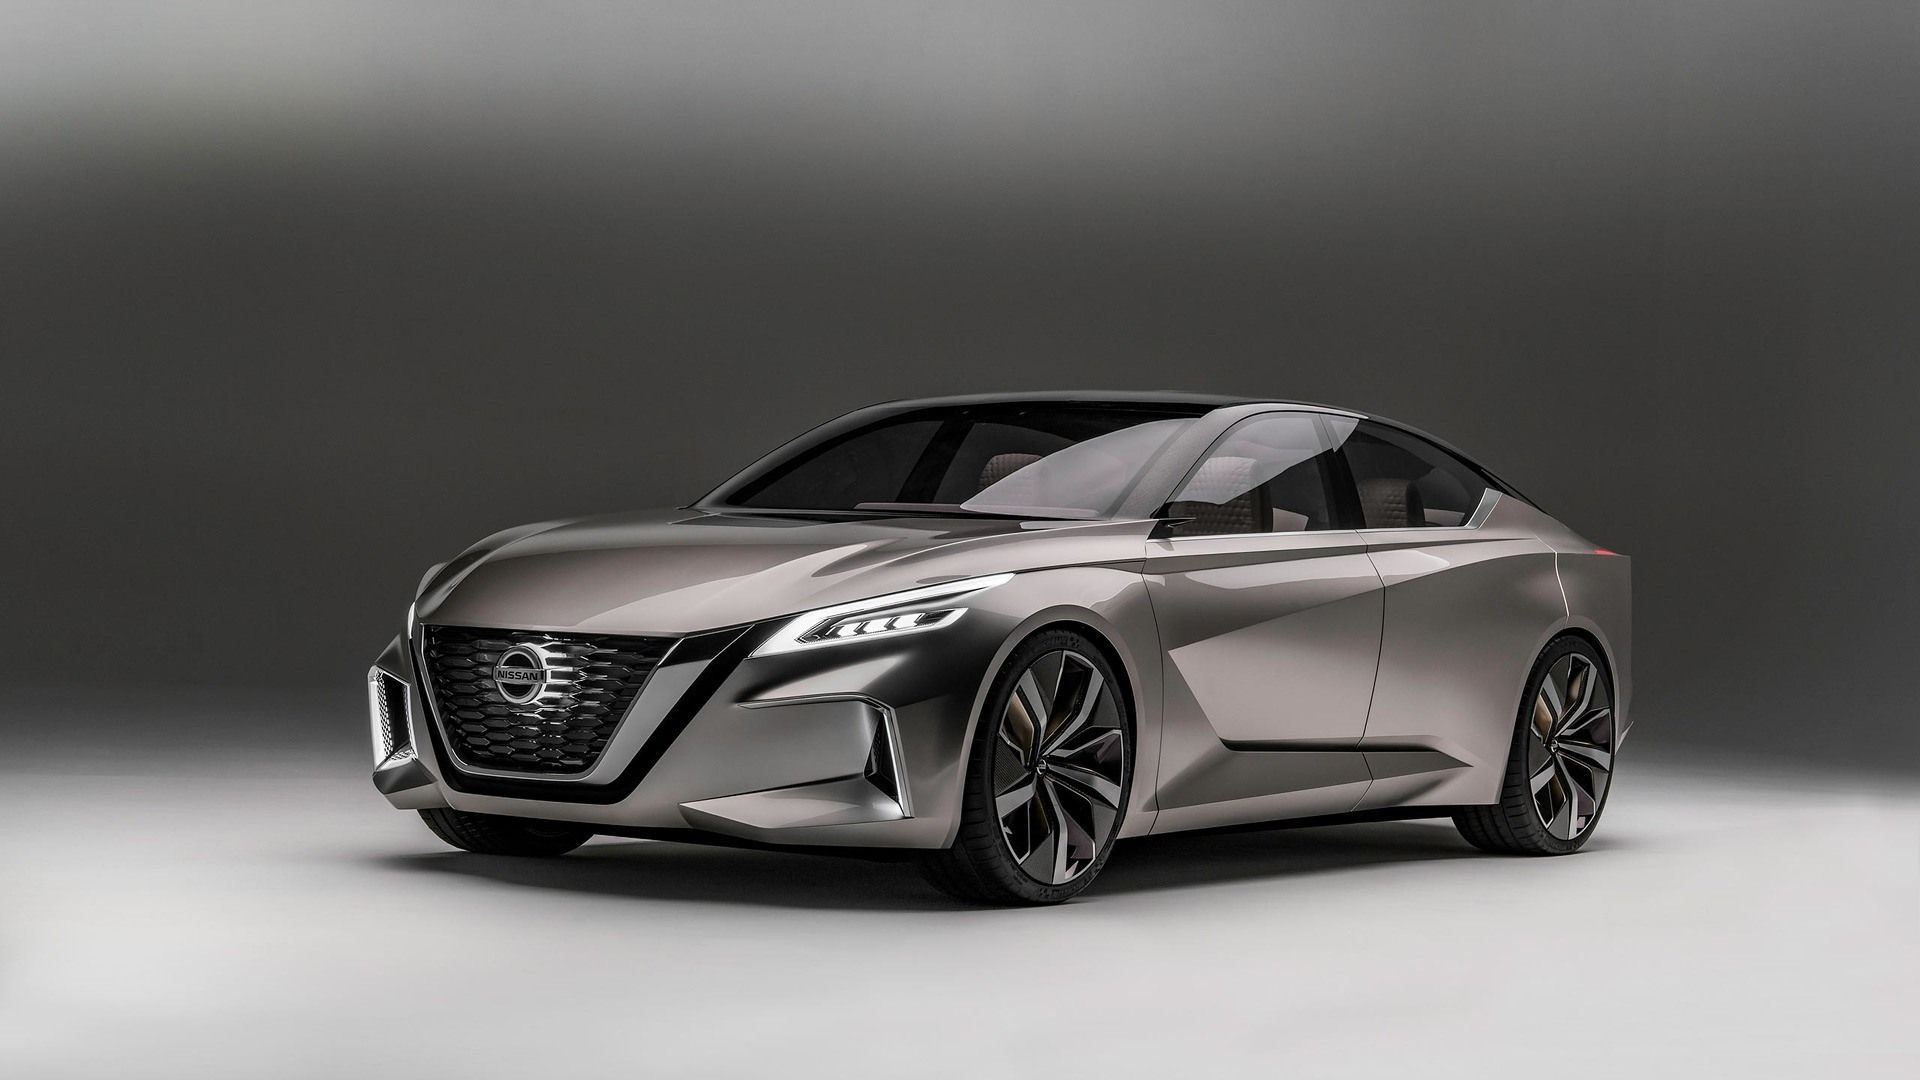 2020 Nissan Maxima Detailed Interior Nissan maxima